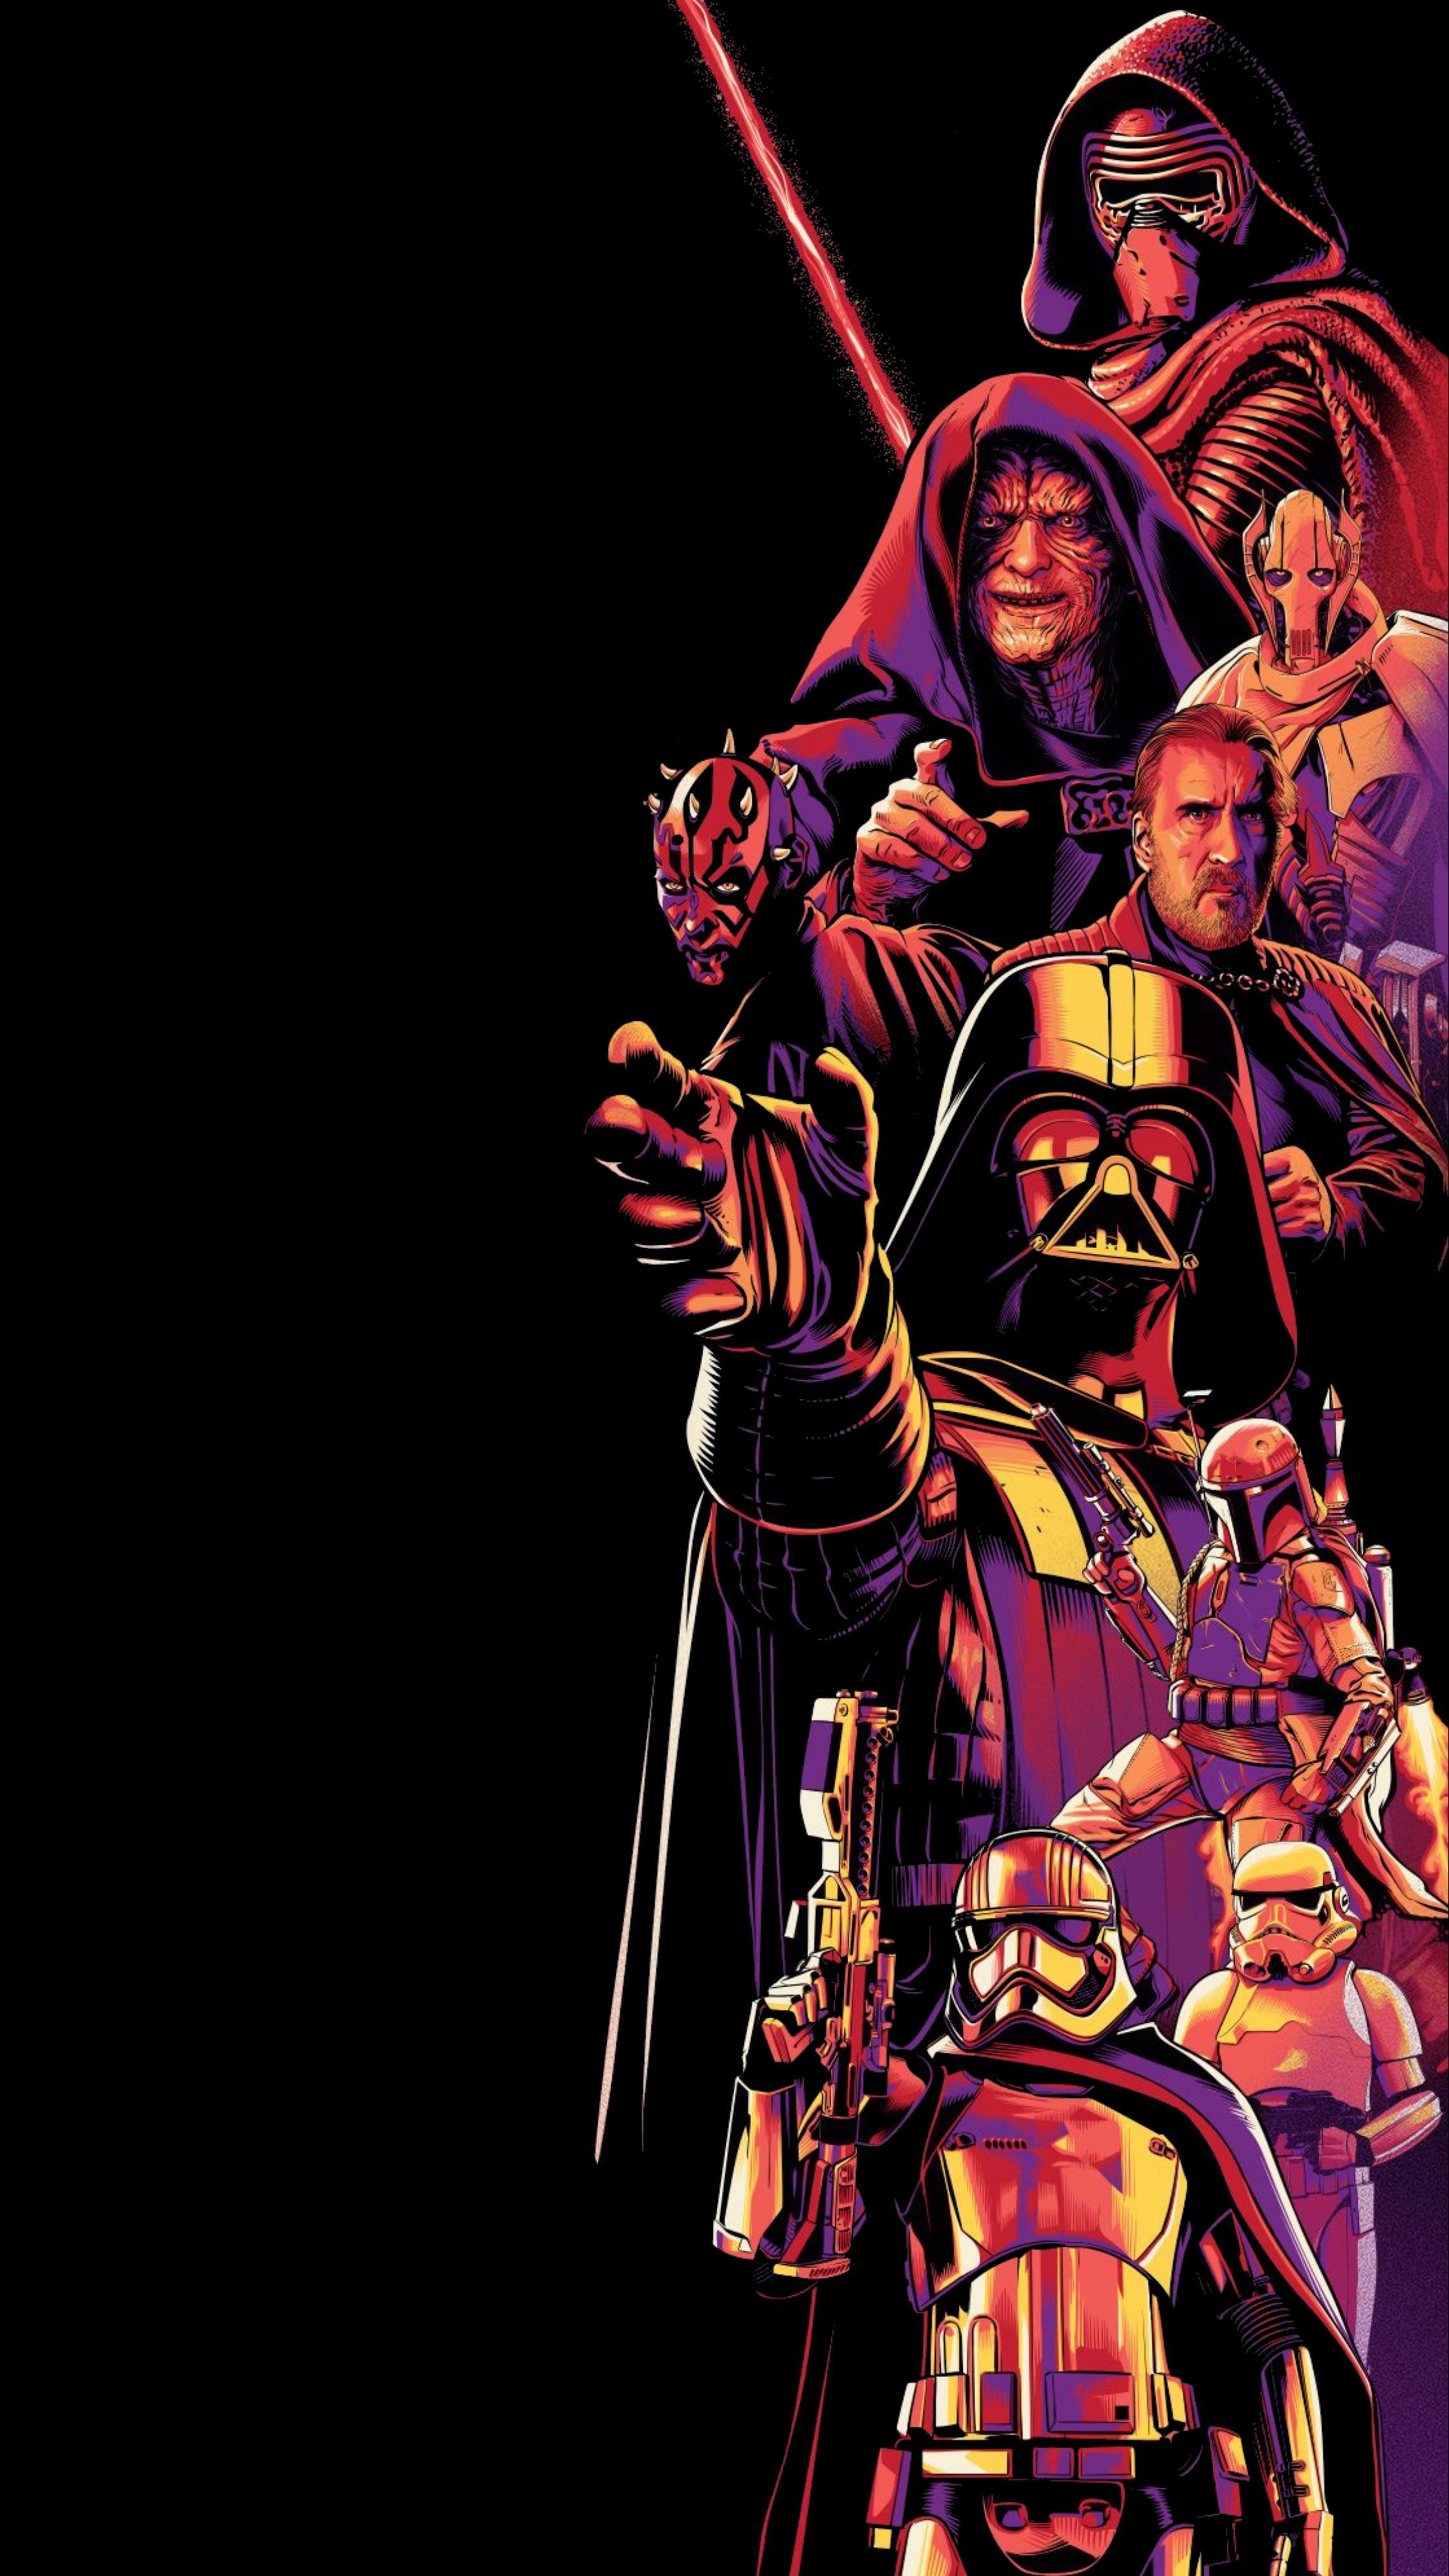 Wallpaper Amoled Dark Star Wars Vertical 2250x4000 Ranul 1744479 Hd Wallpapers Wallhere